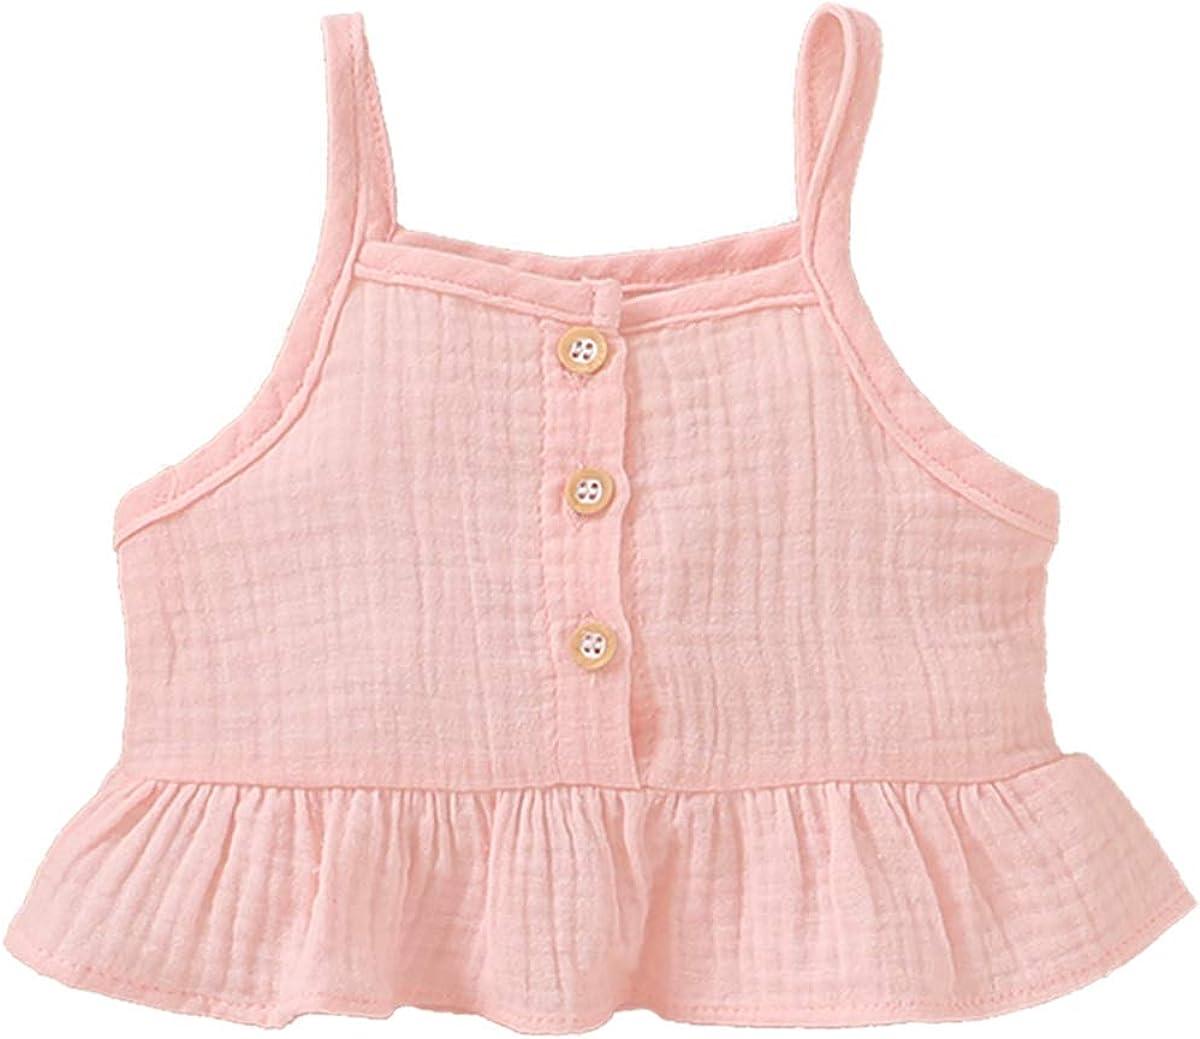 DaMohony Vestiti da Bambina con Canotta e Pantaloncini per Bambini da 0 a 18 Mesi